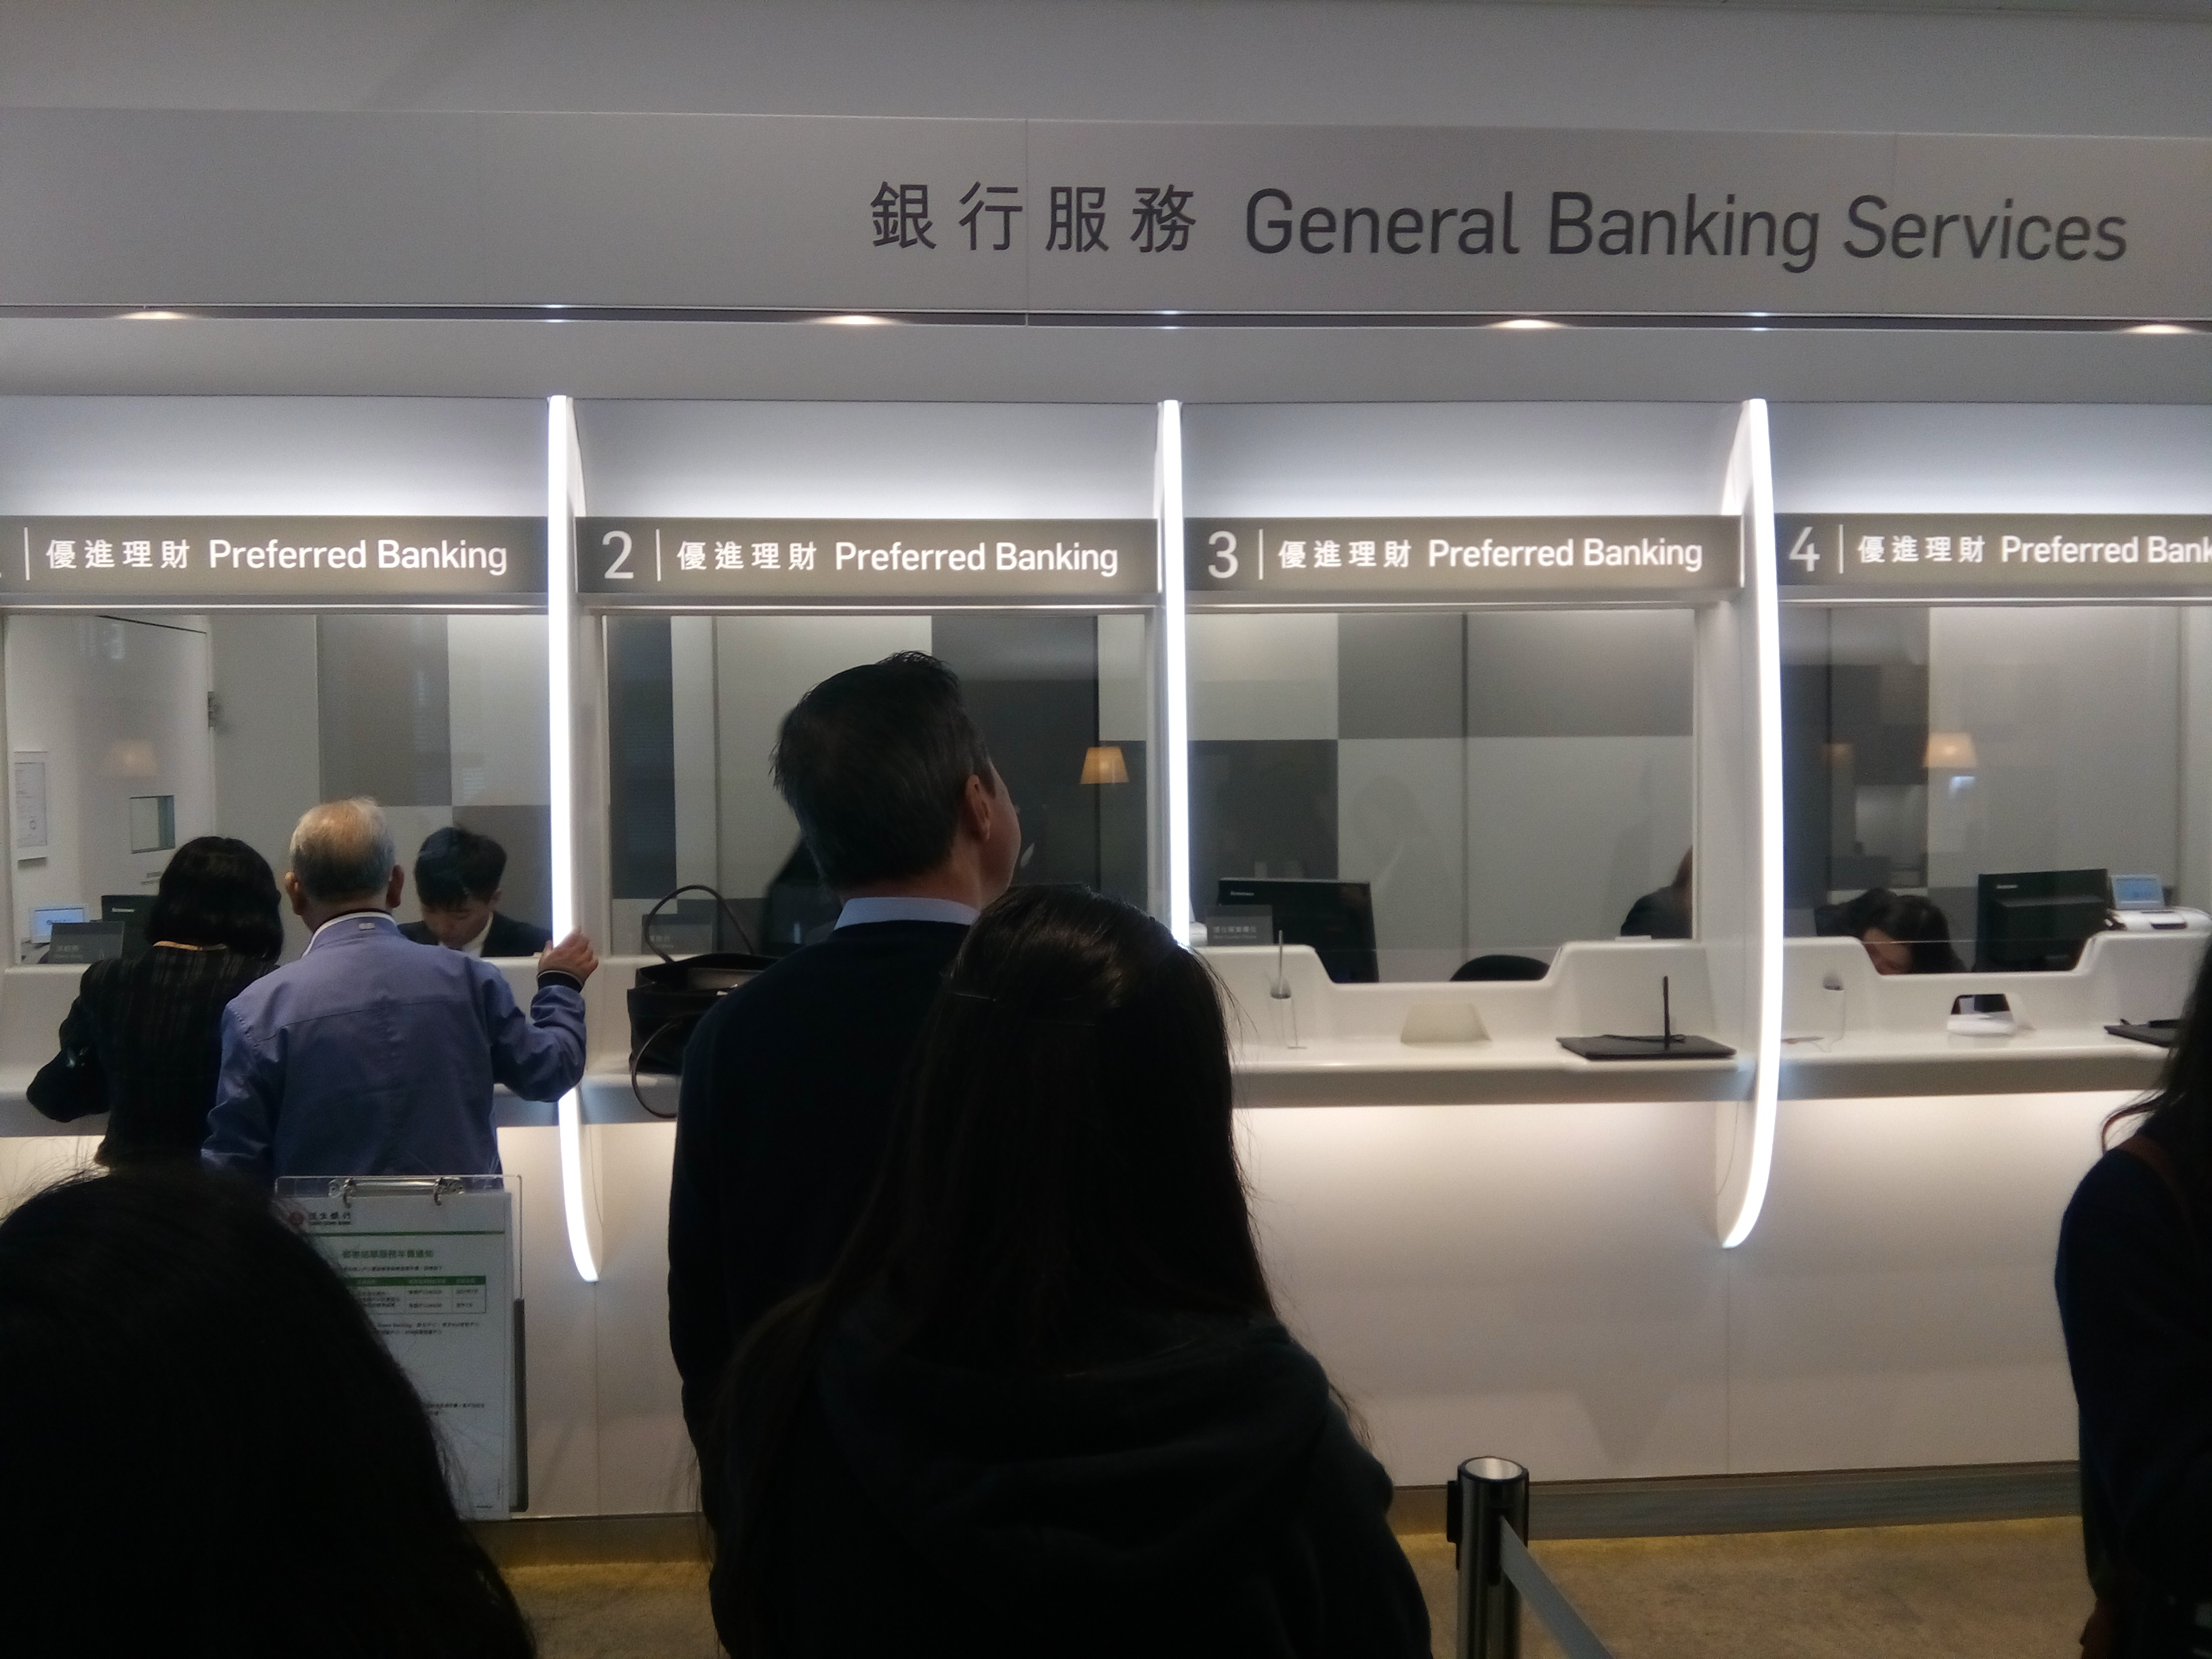 File Hk Causeway Bay Hang Seng Branch Interior Yee Woo Street December 2016 Lnv3 恆生銀行 Service Counters Jpg Wikimedia Commons